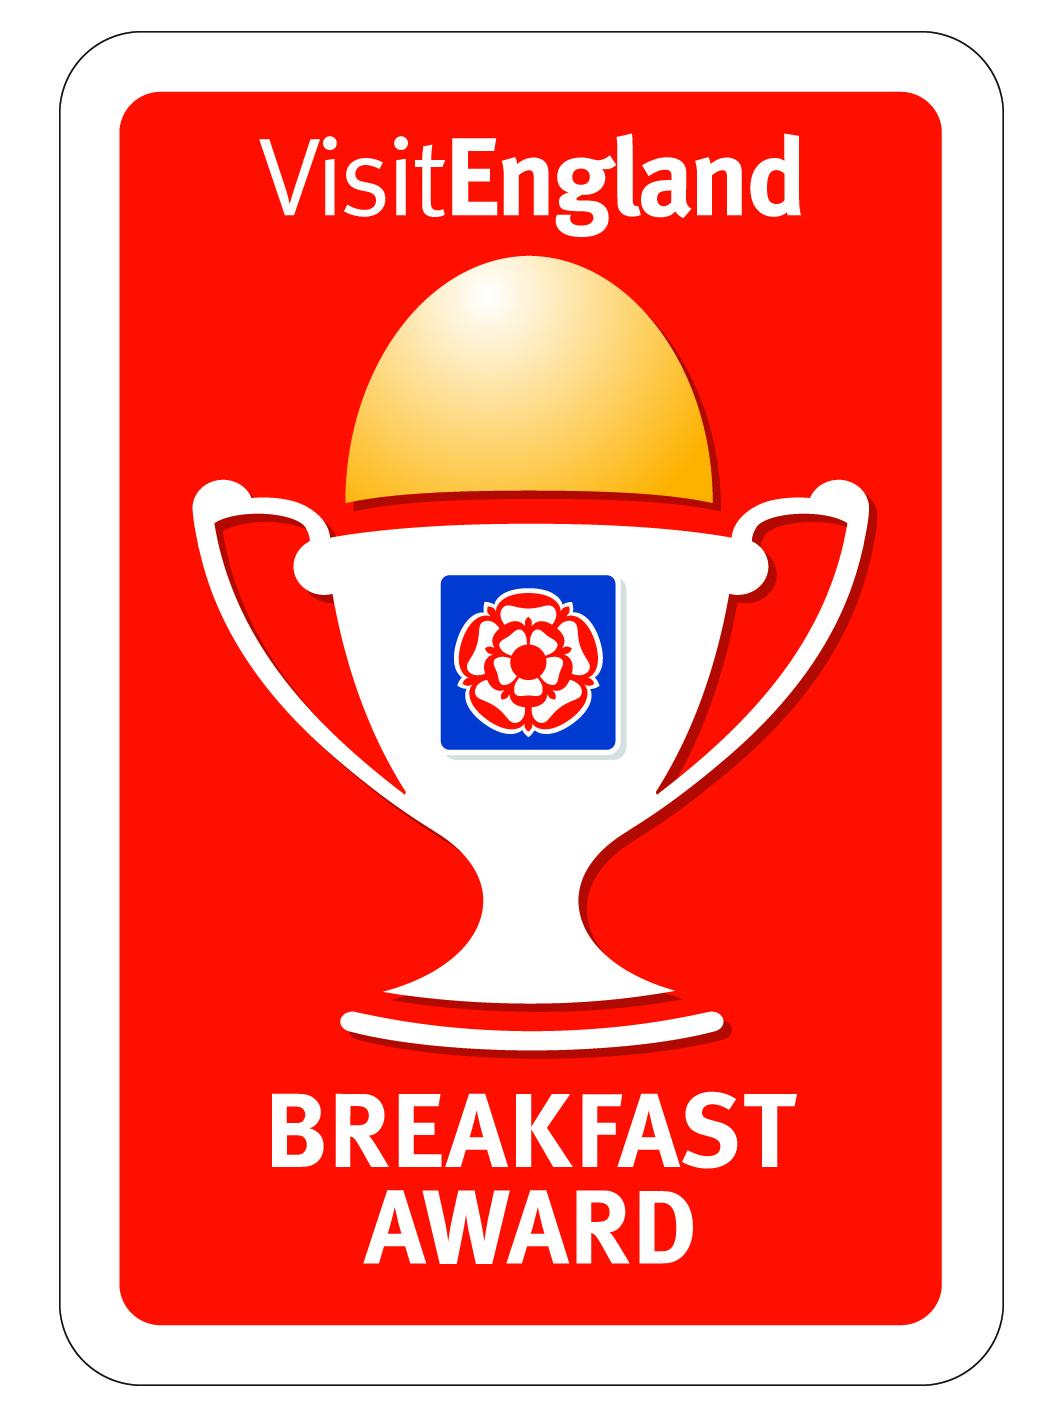 Breakfast Award.jpg